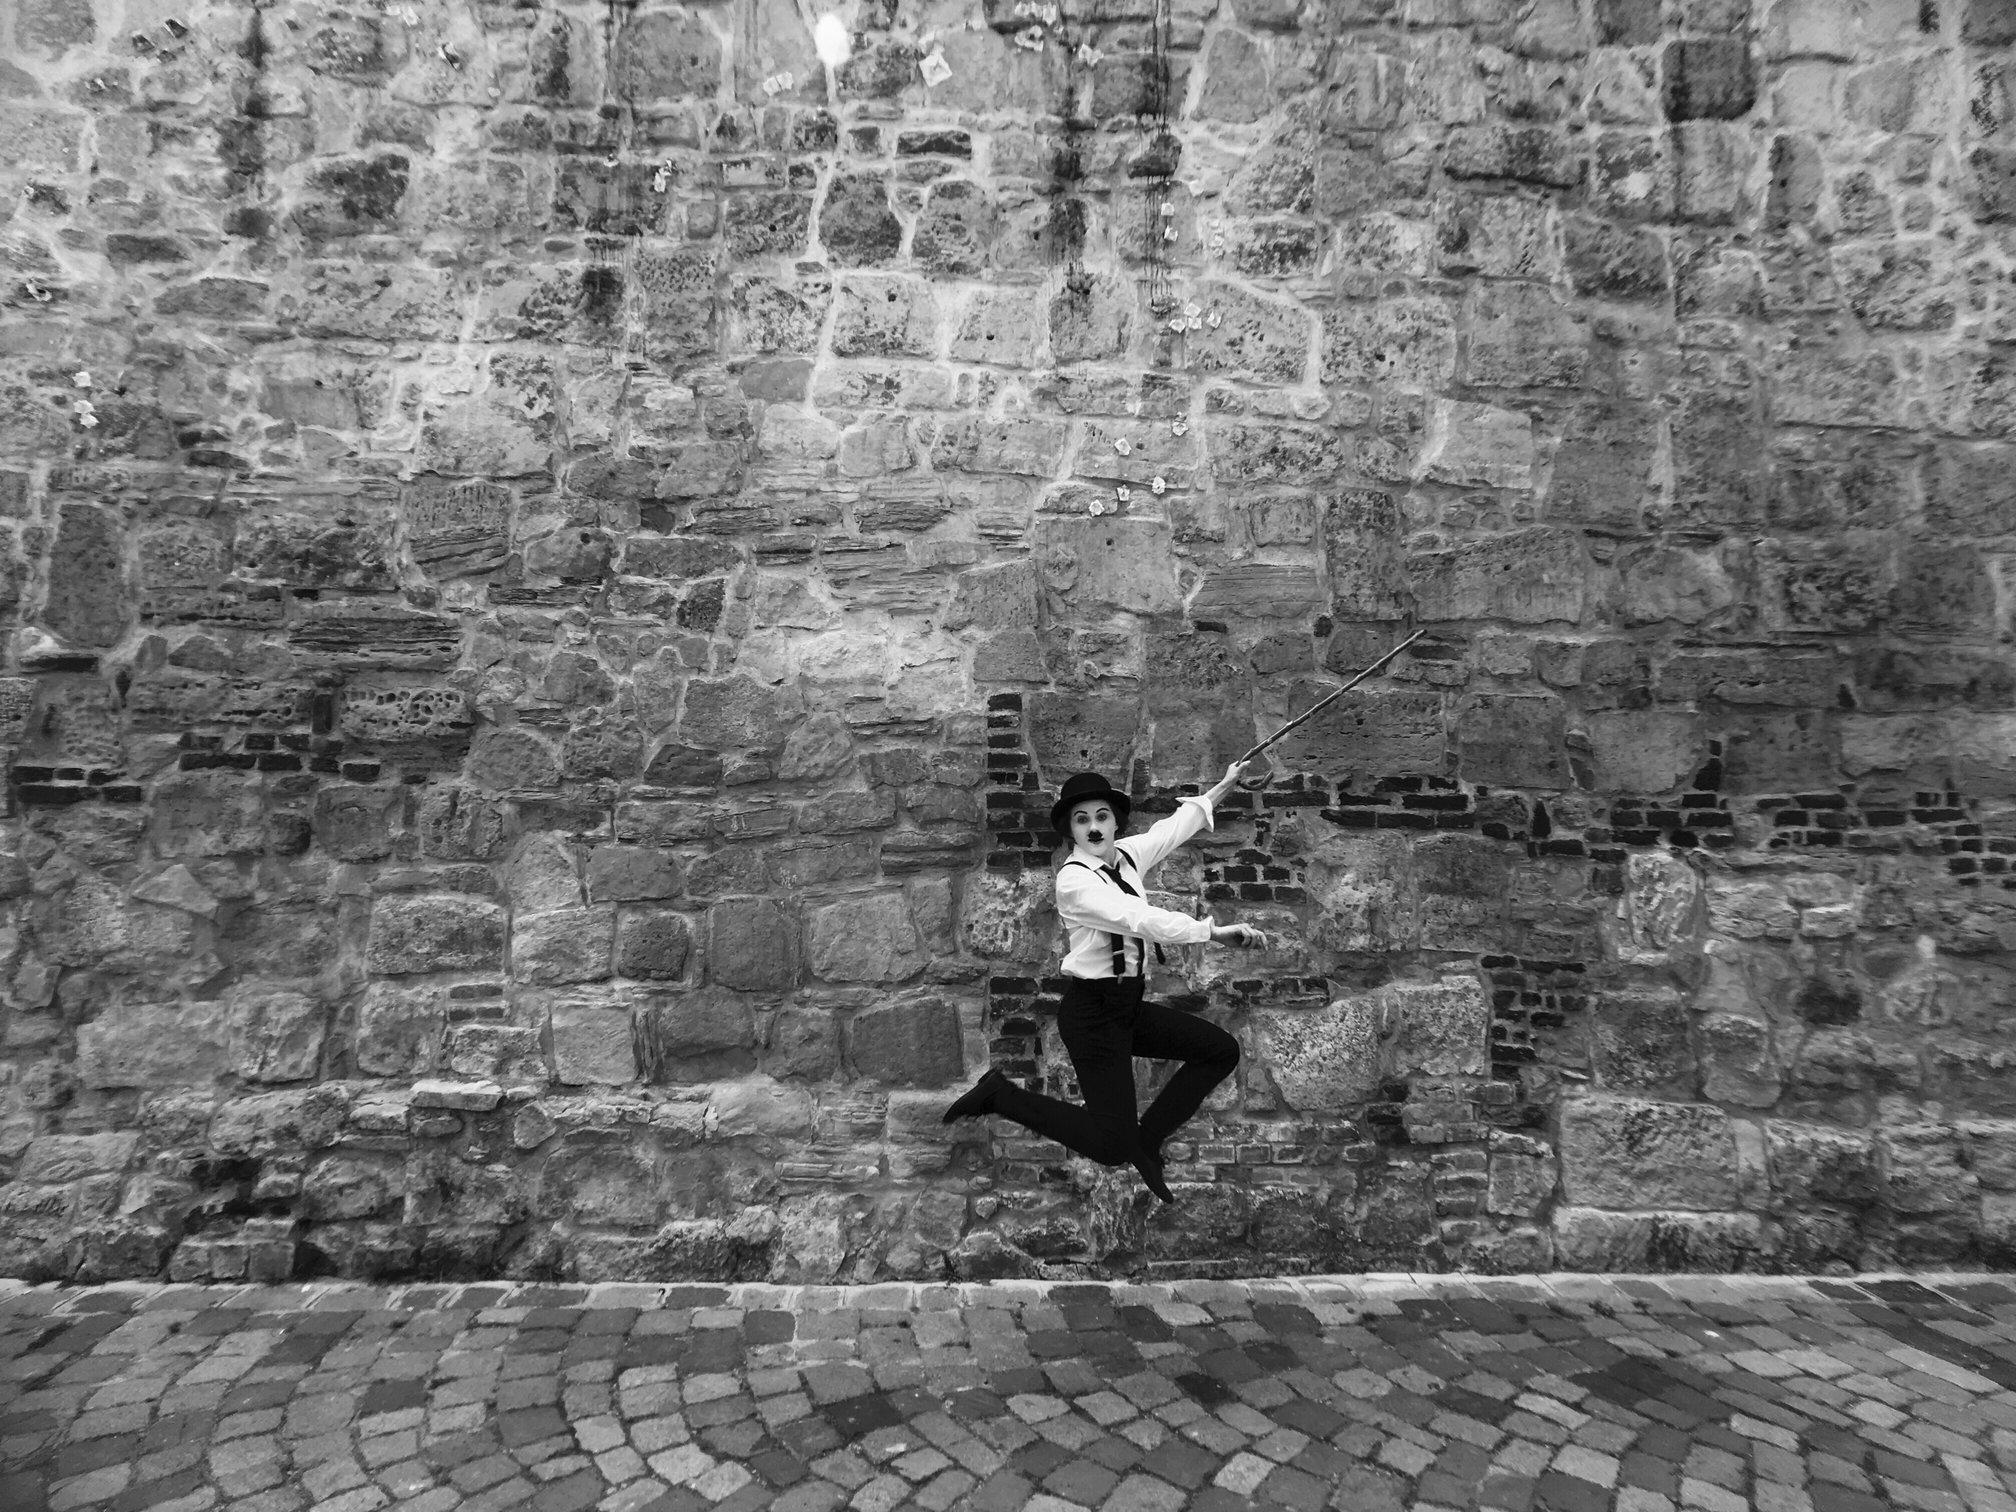 rsz_poza_intrebare_4_-foto_credit_mihail_onca